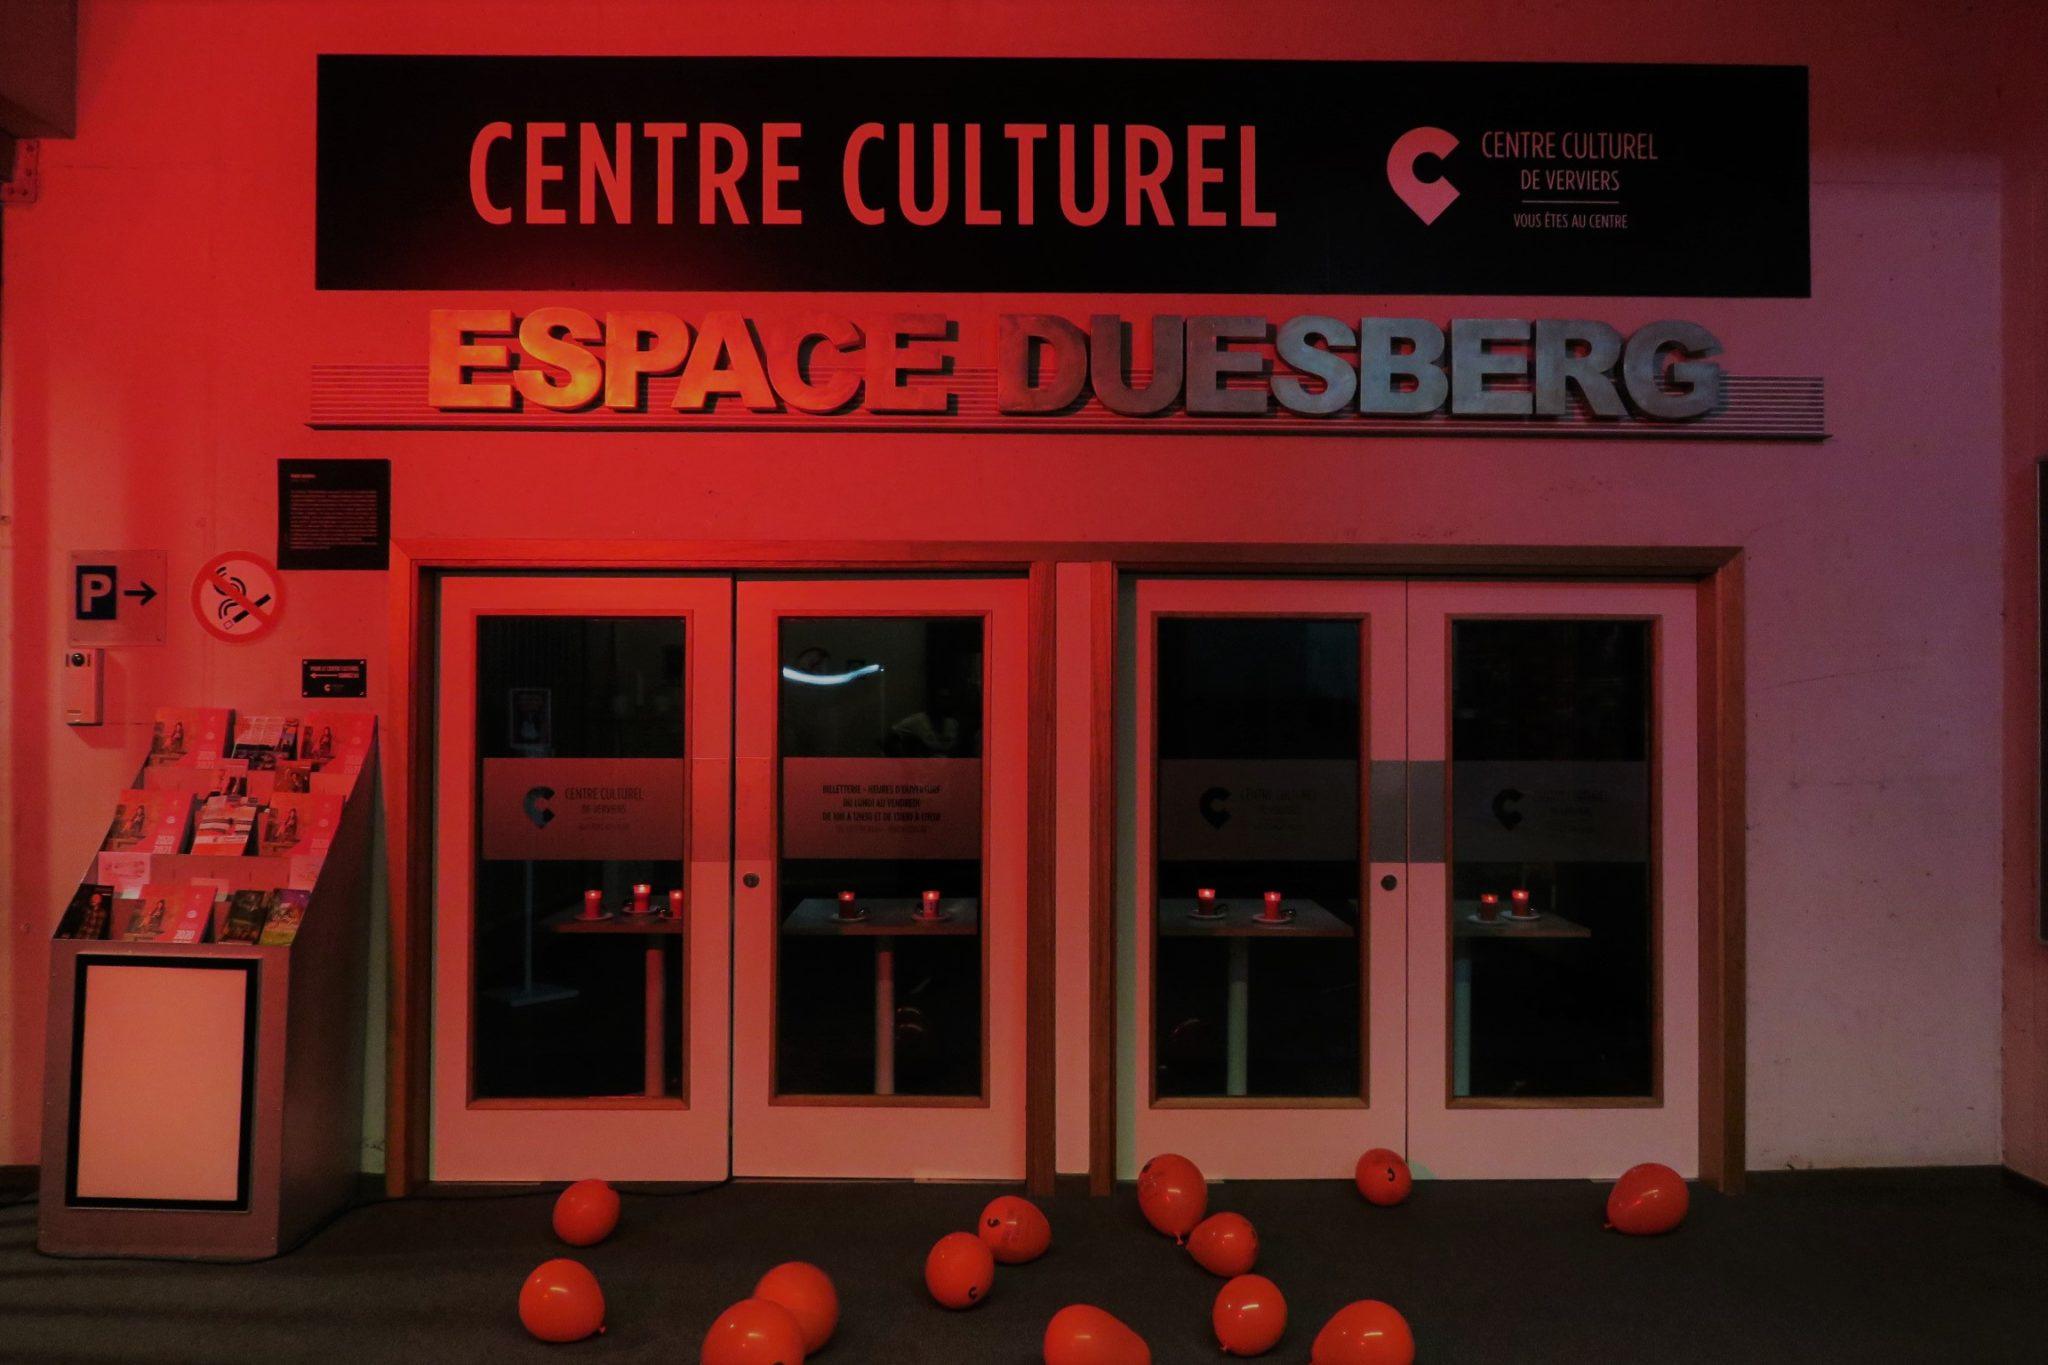 CC Verviers